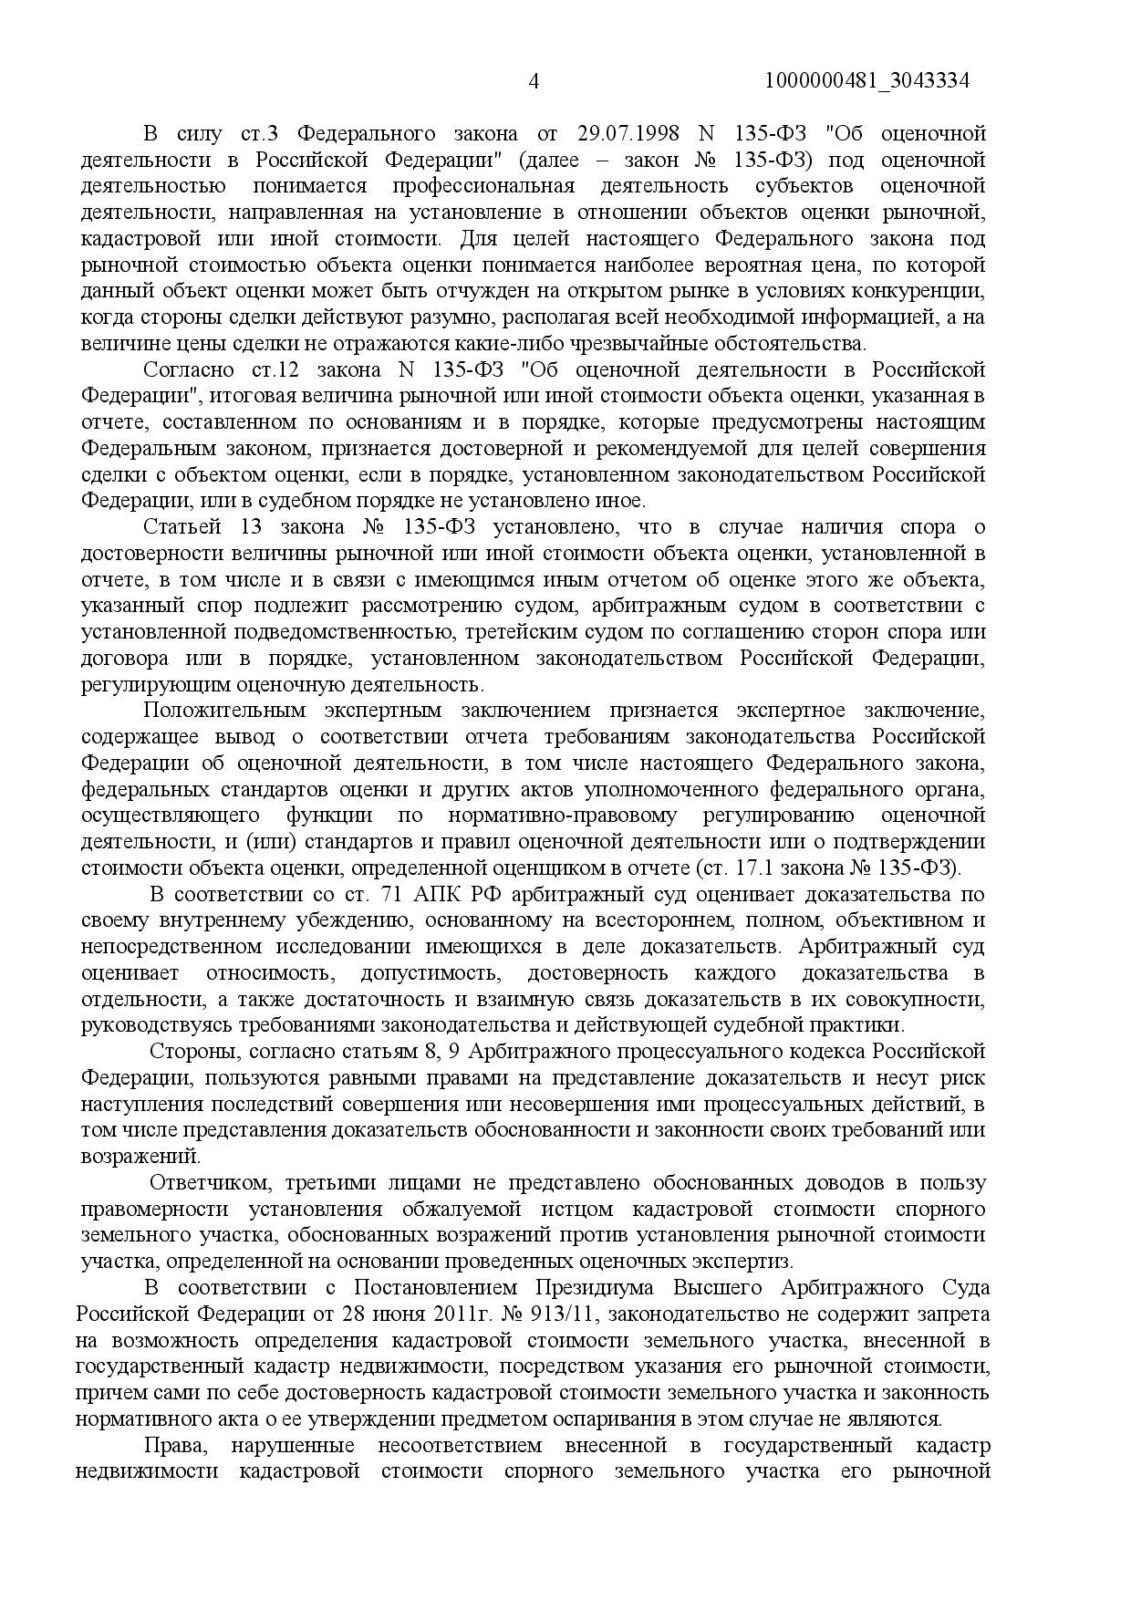 A41-38449-2014_20141008_Reshenija i postanovlenija-004